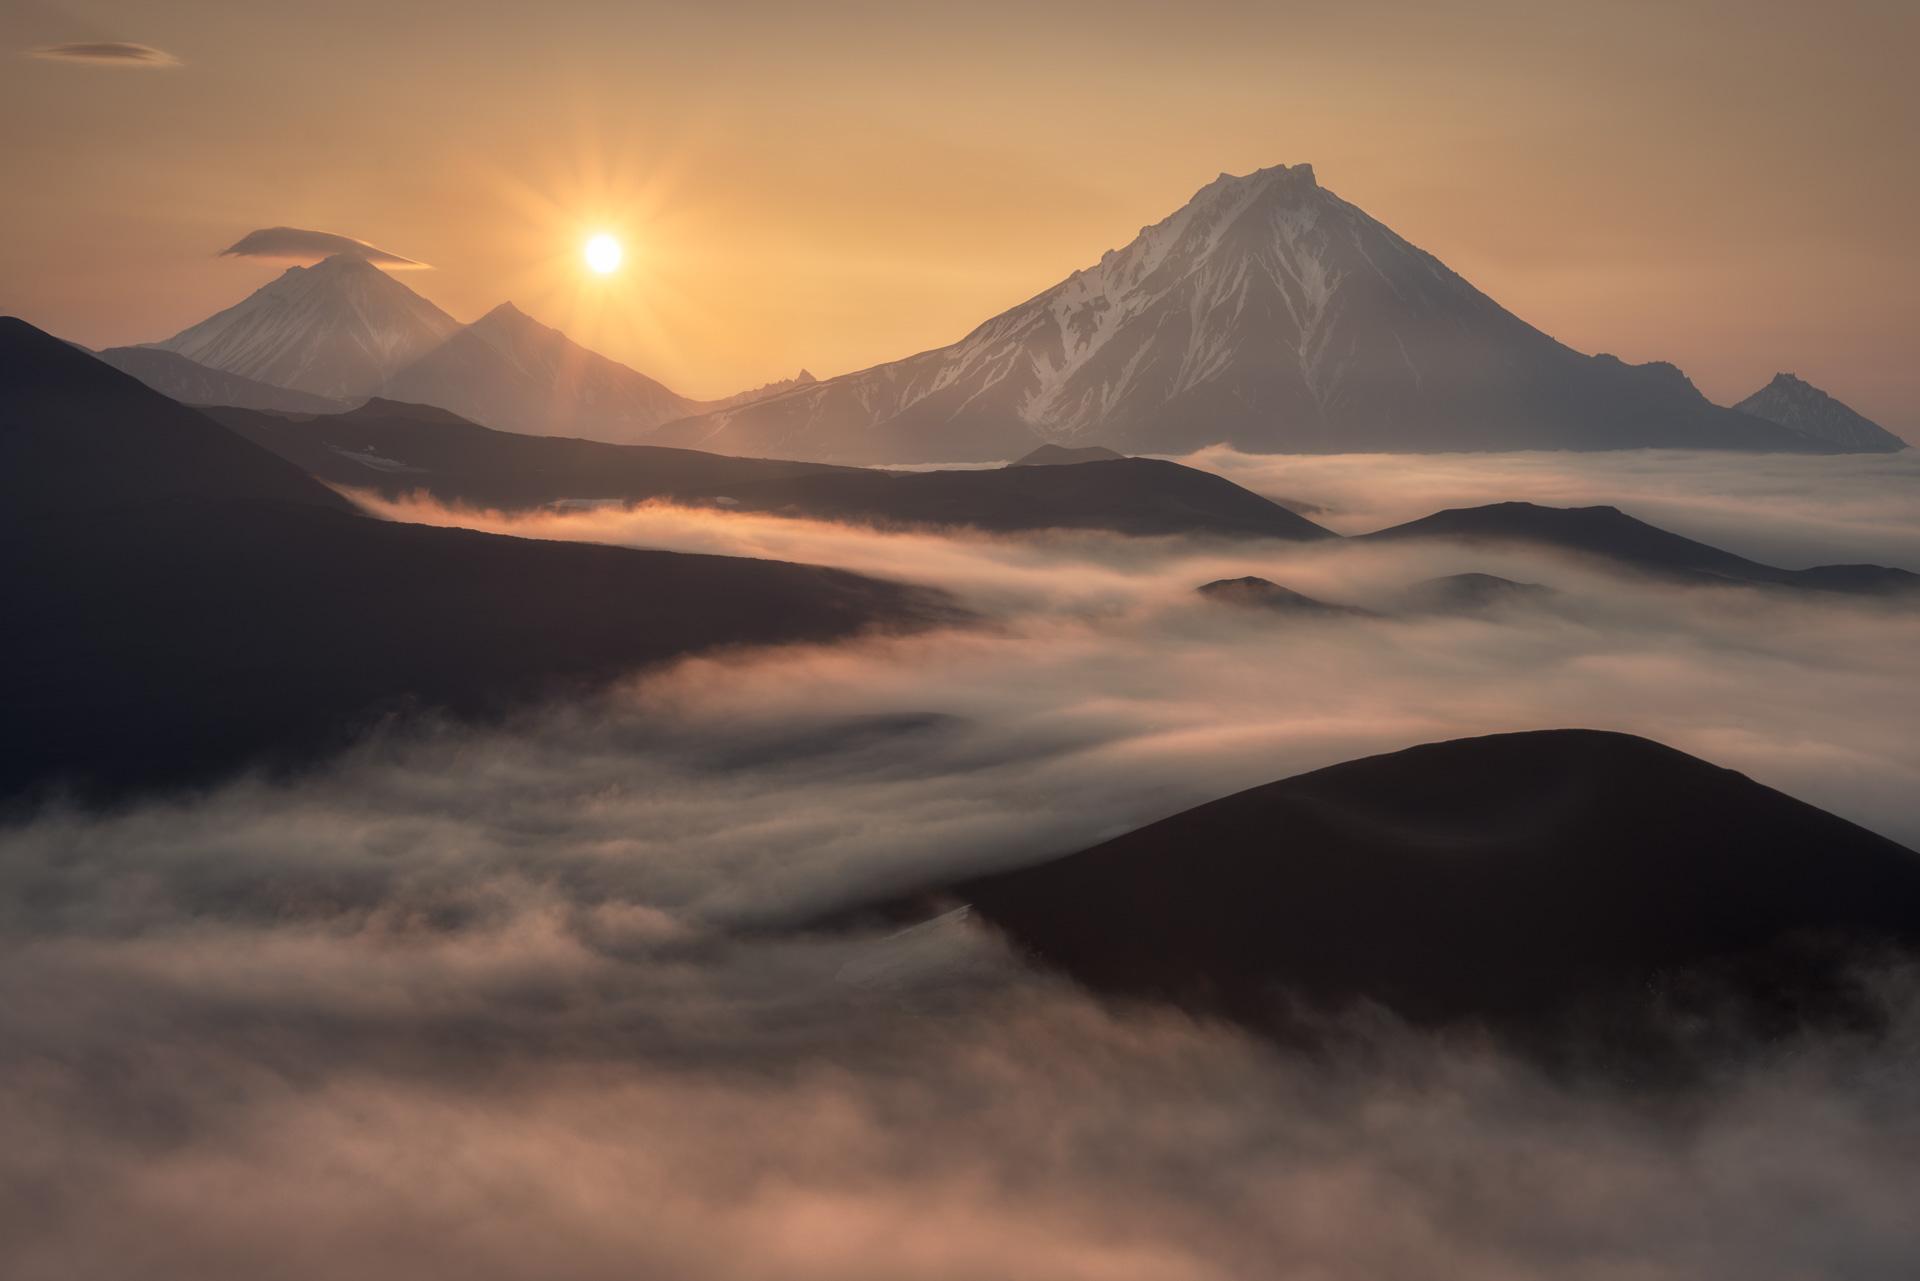 tolbachik kamchatka volcanic cone cloud sea photo tour sunrise